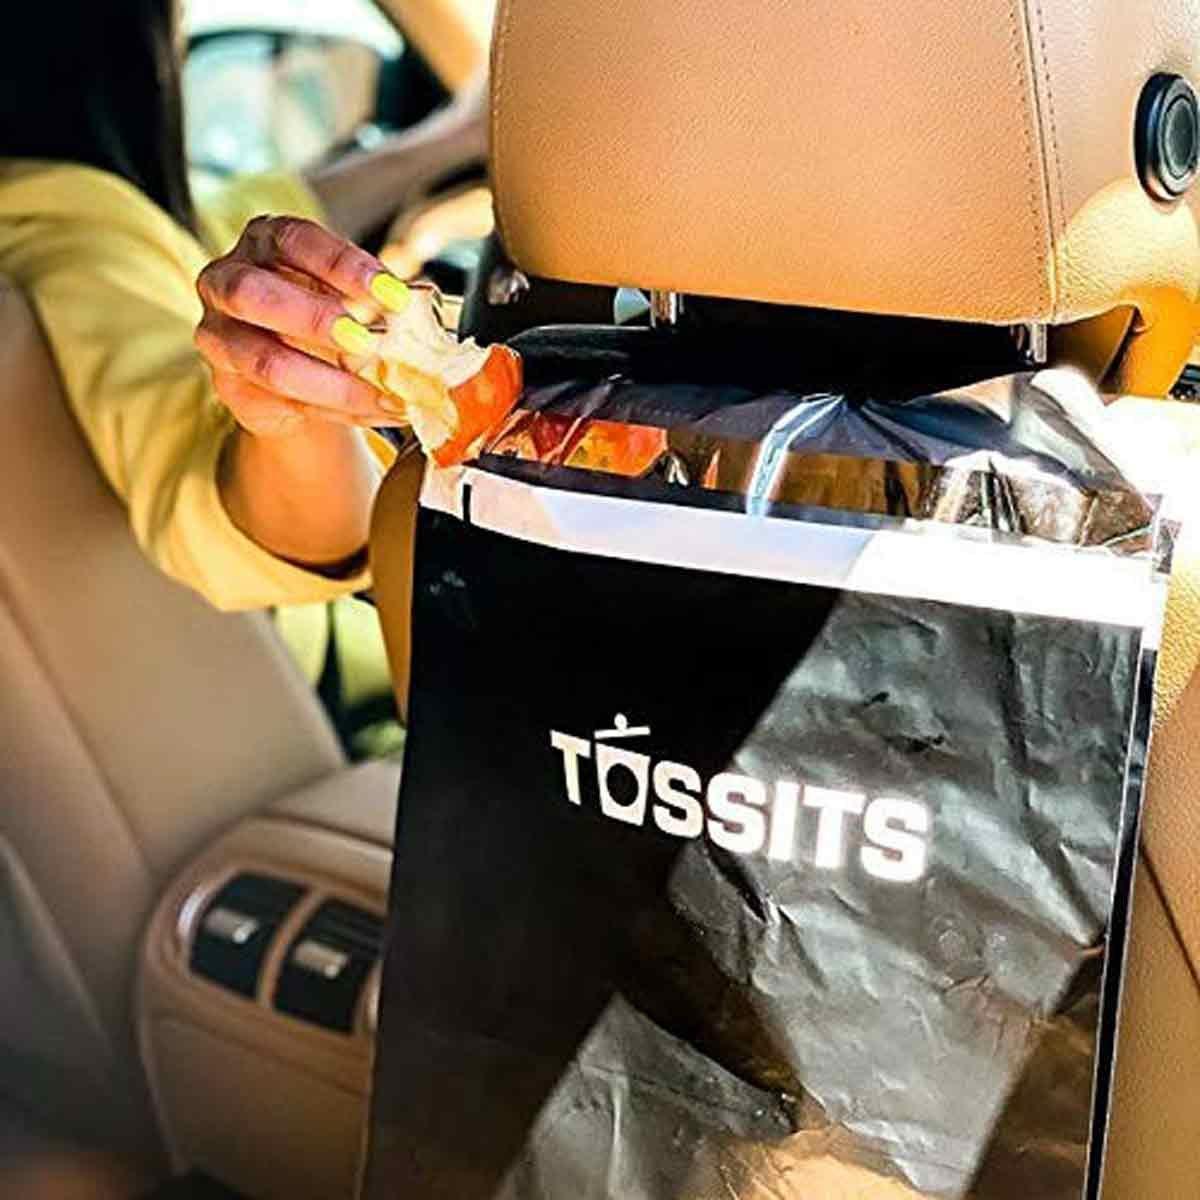 Tossits-car-garbage-bag